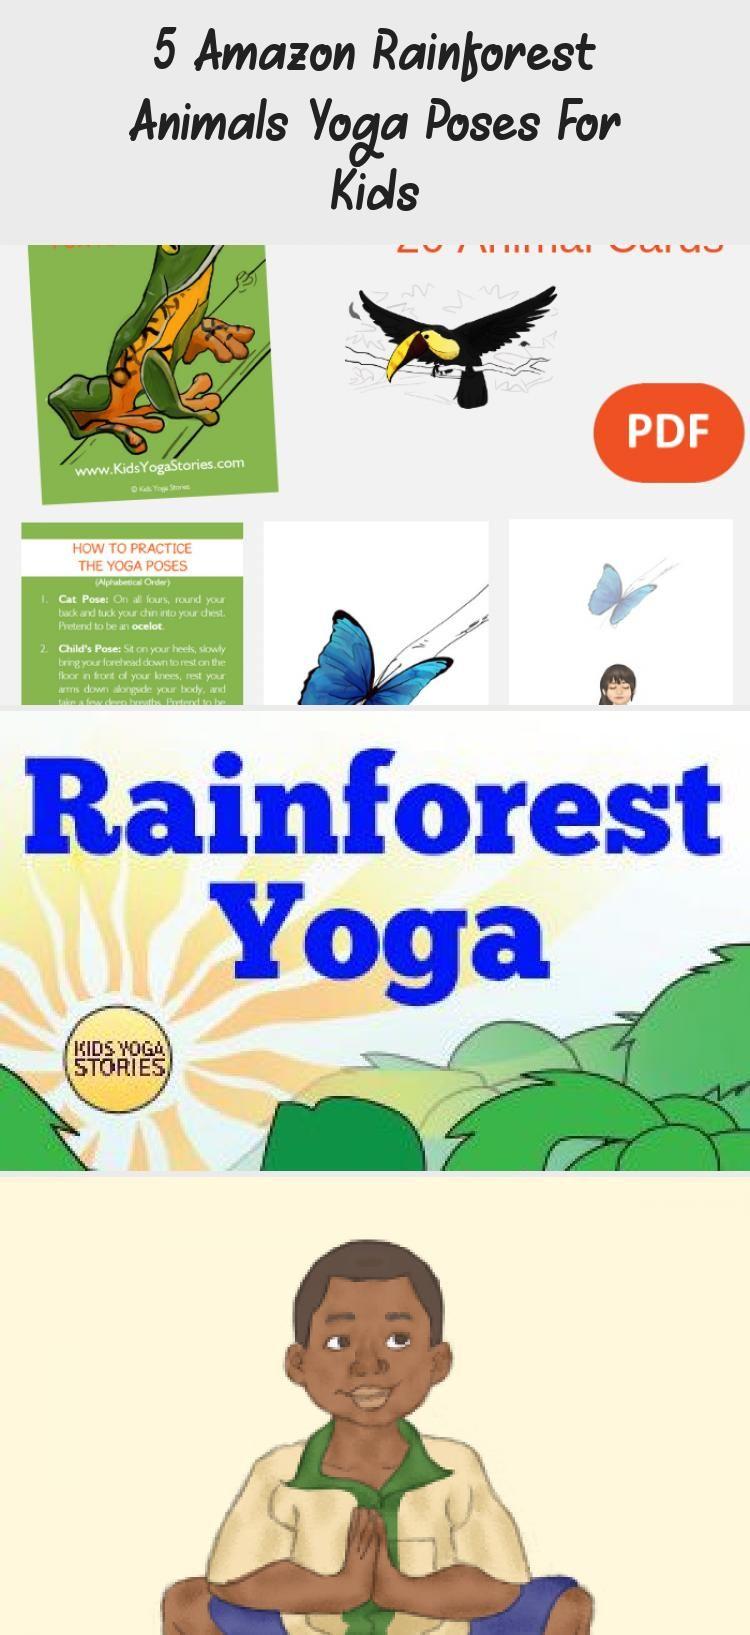 5 Easy And Fun Amazon Rainforest Animal Yoga Poses For Kids